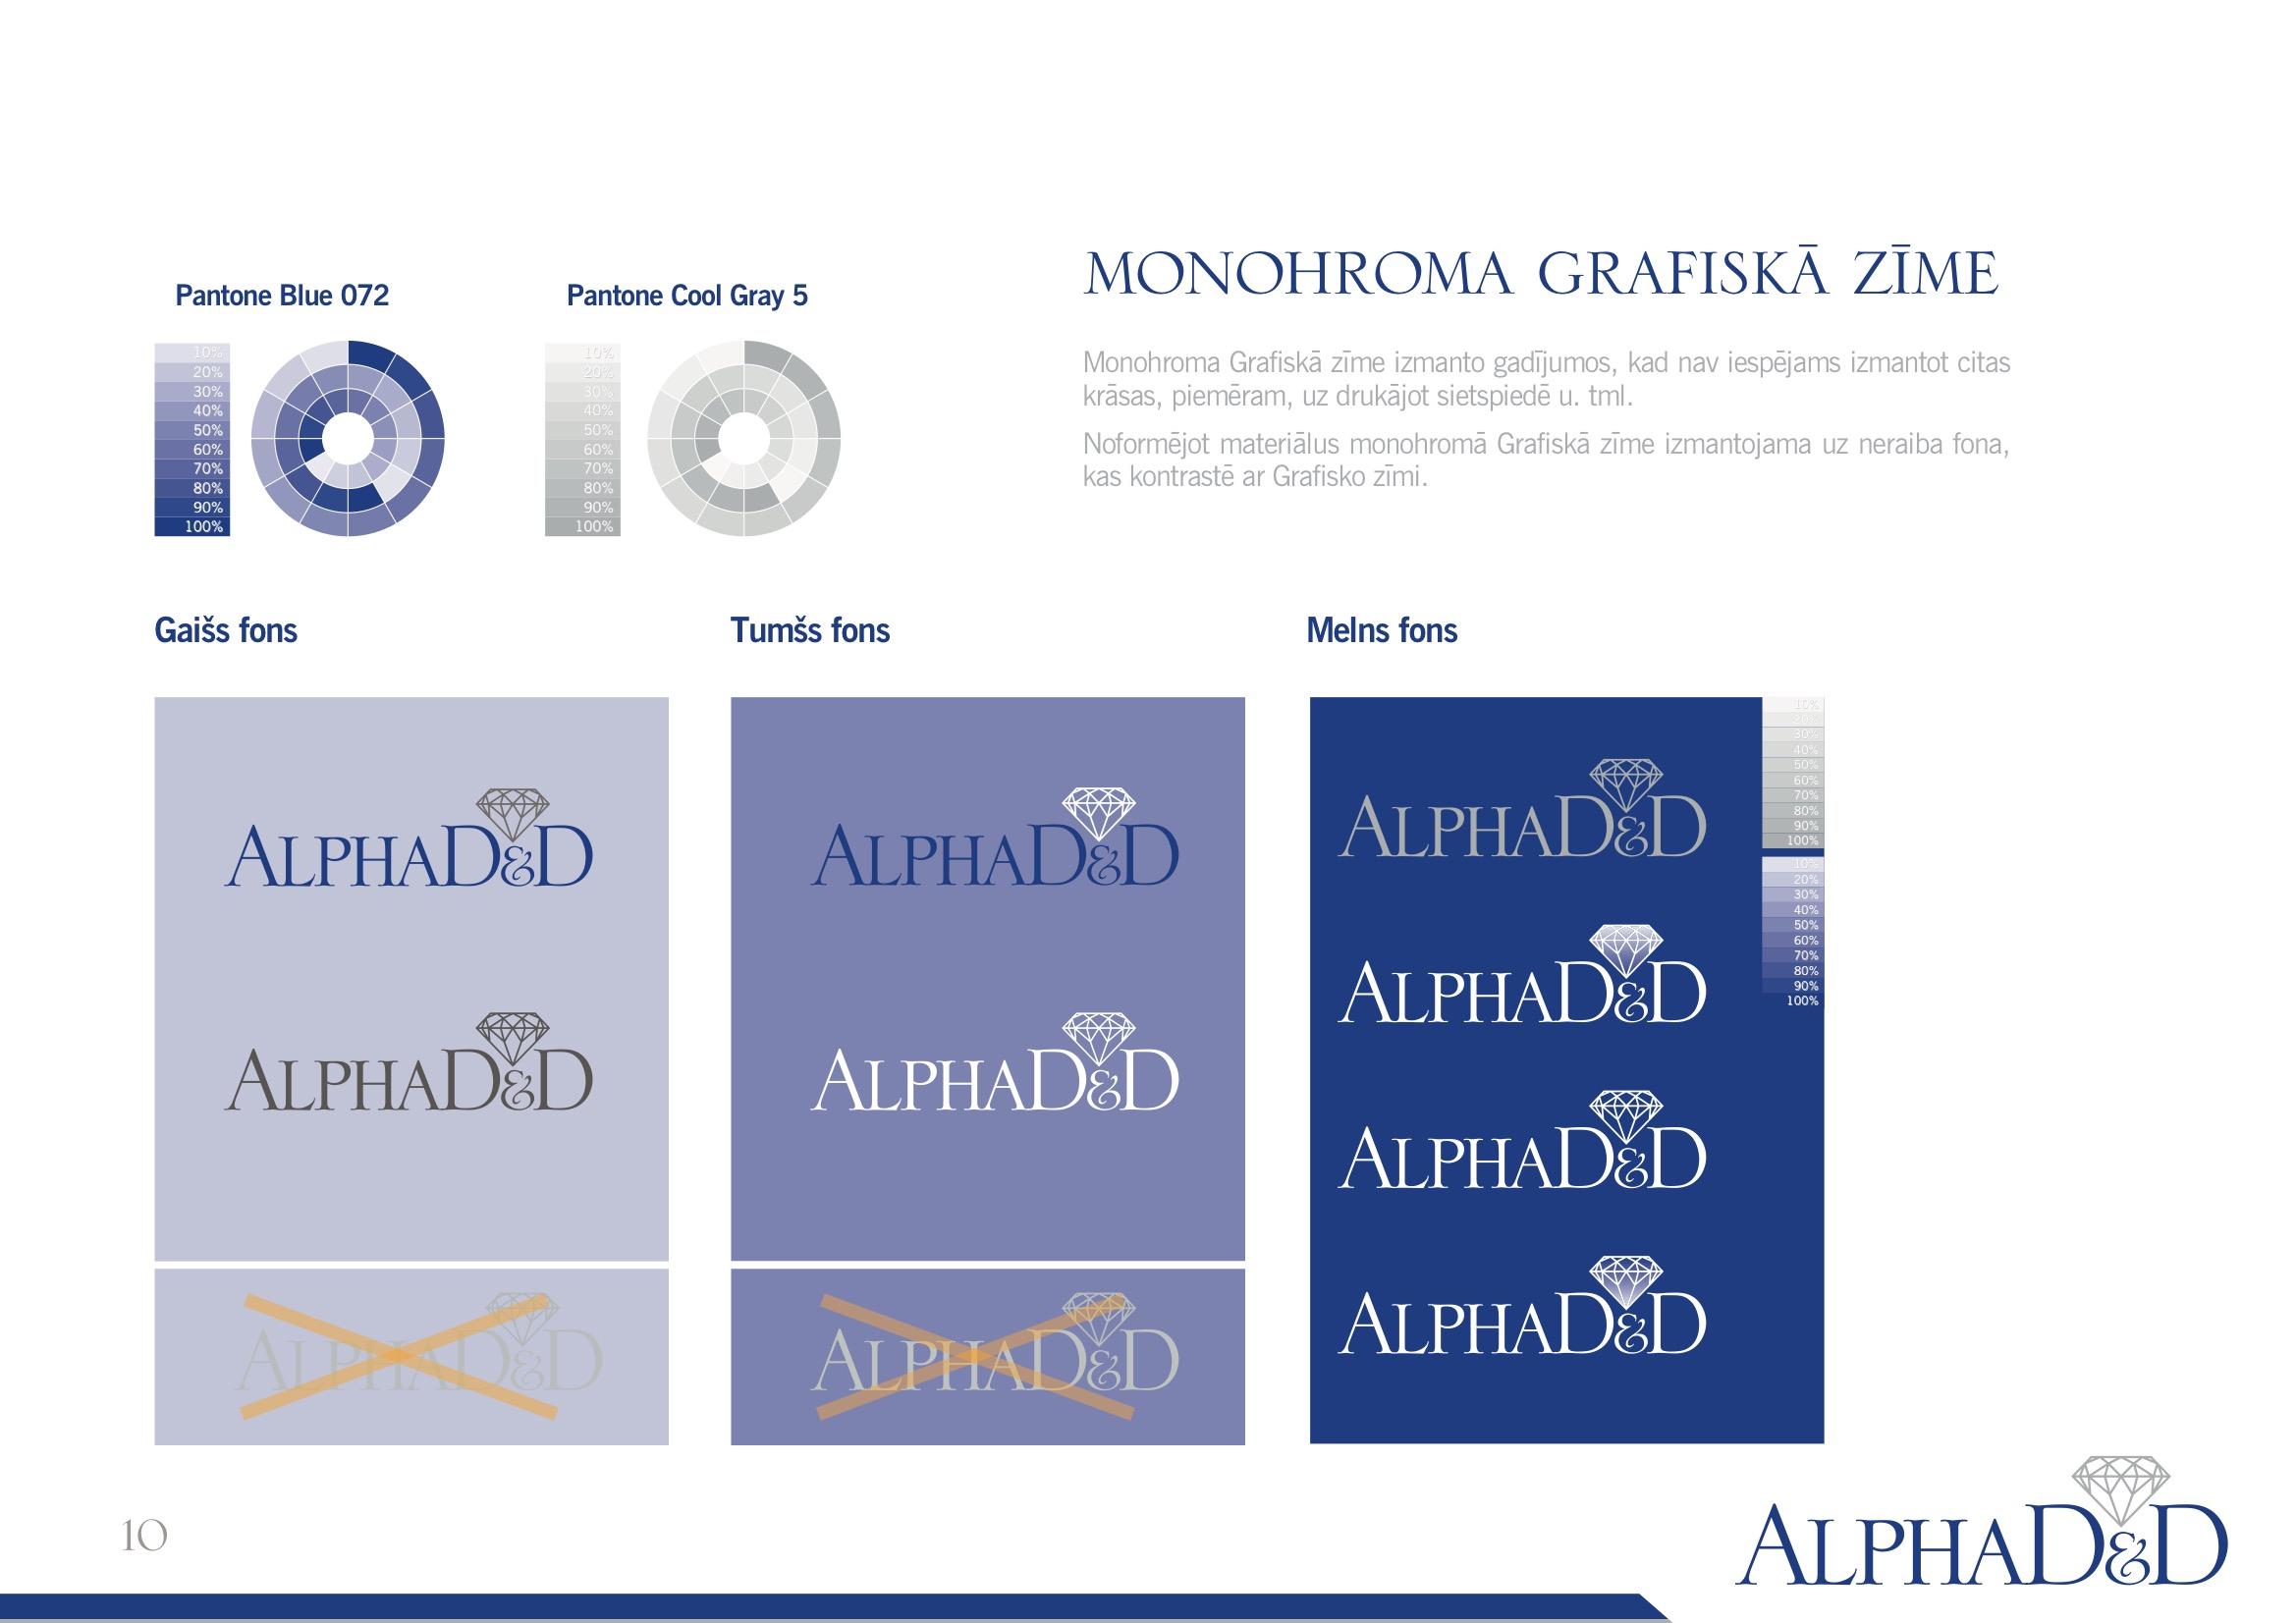 AlphaDD_Stils 10